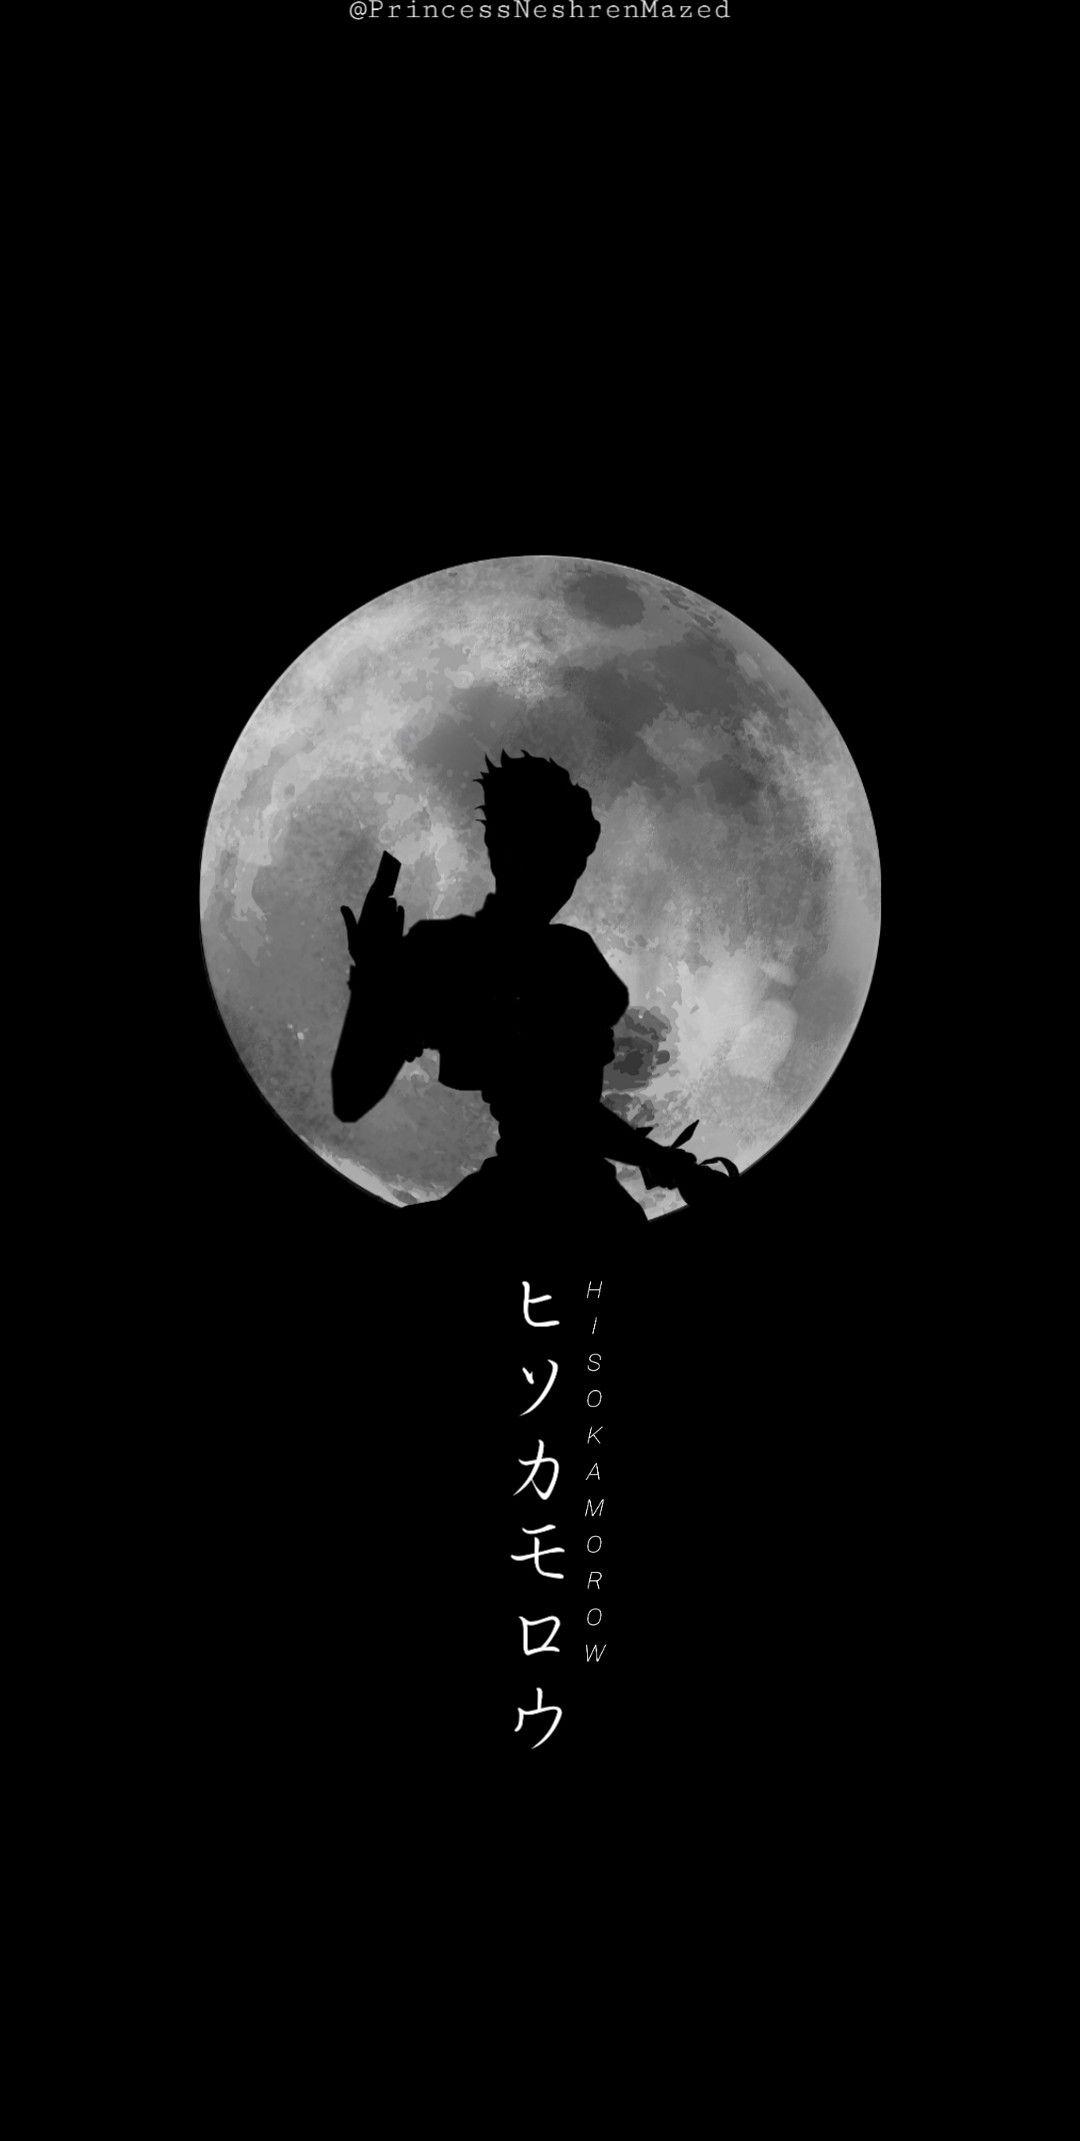 Hisoka Morow Hunter Anime Dark Anime Cute Anime Wallpaper Black full hd anime wallpaper phone